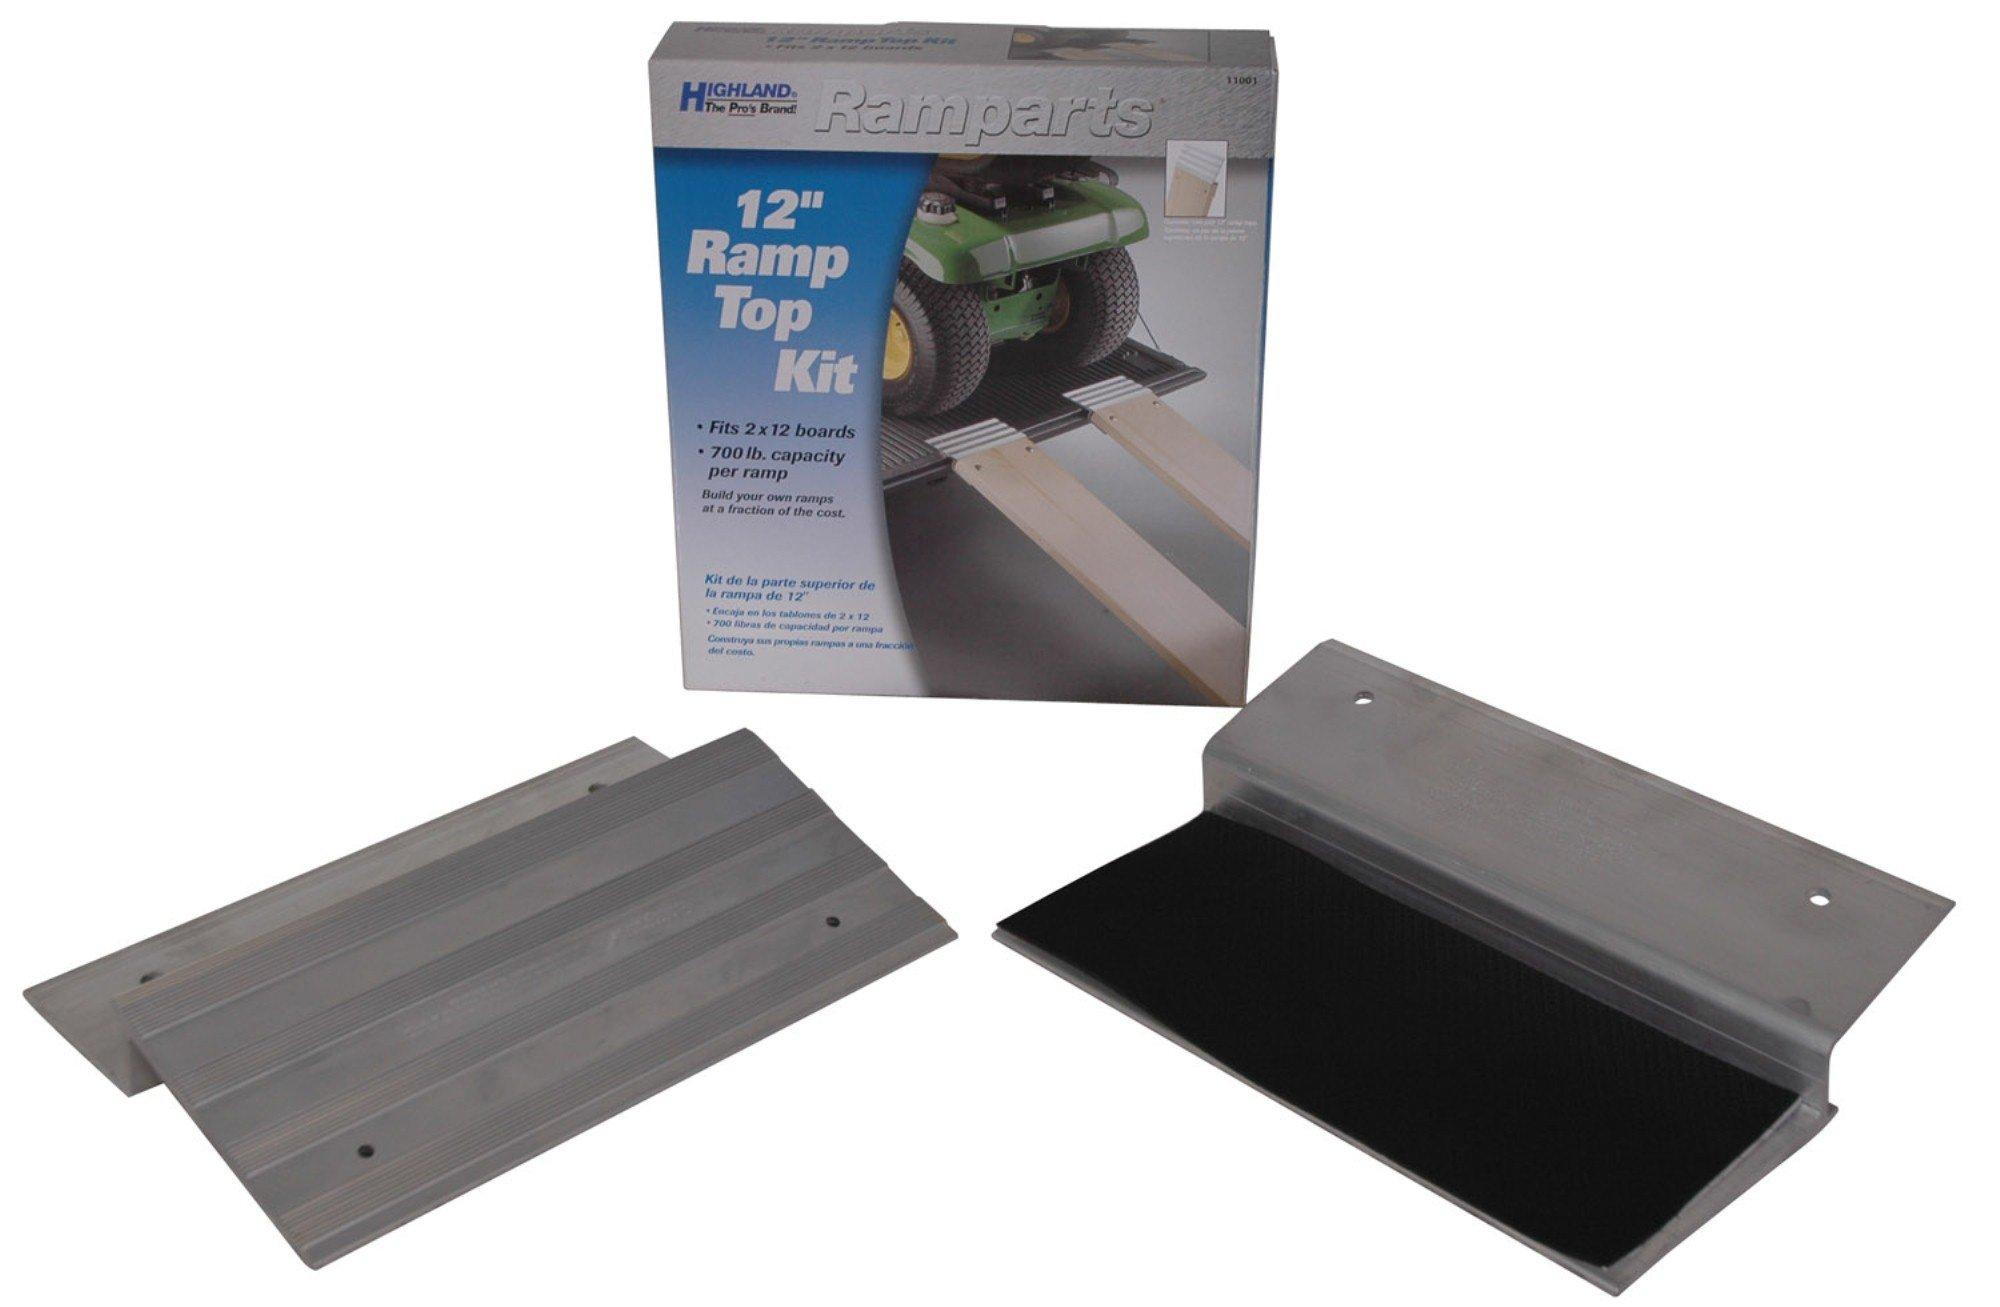 Highland (1100100) Ramparts 12'' Aluminum Ramp Top Kit - 2 Piece